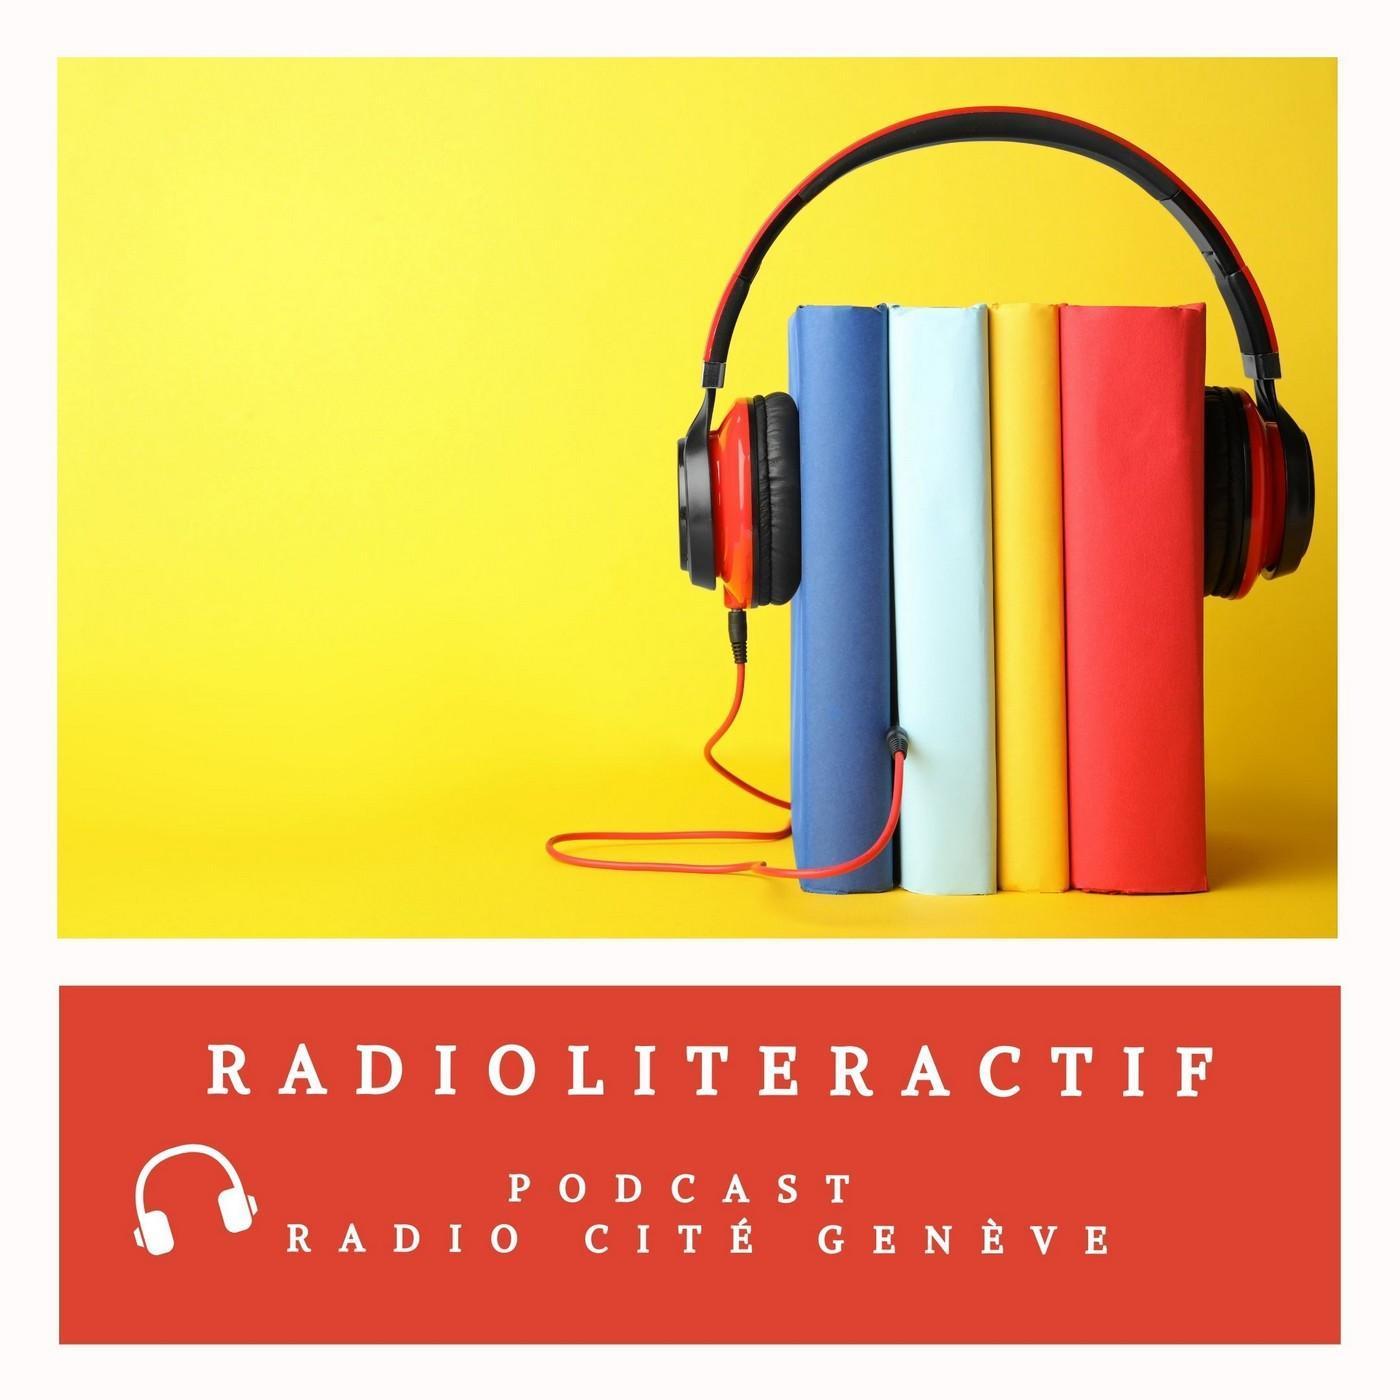 Radioliteractif du 30/08/2021 -  P. Vandenberghe